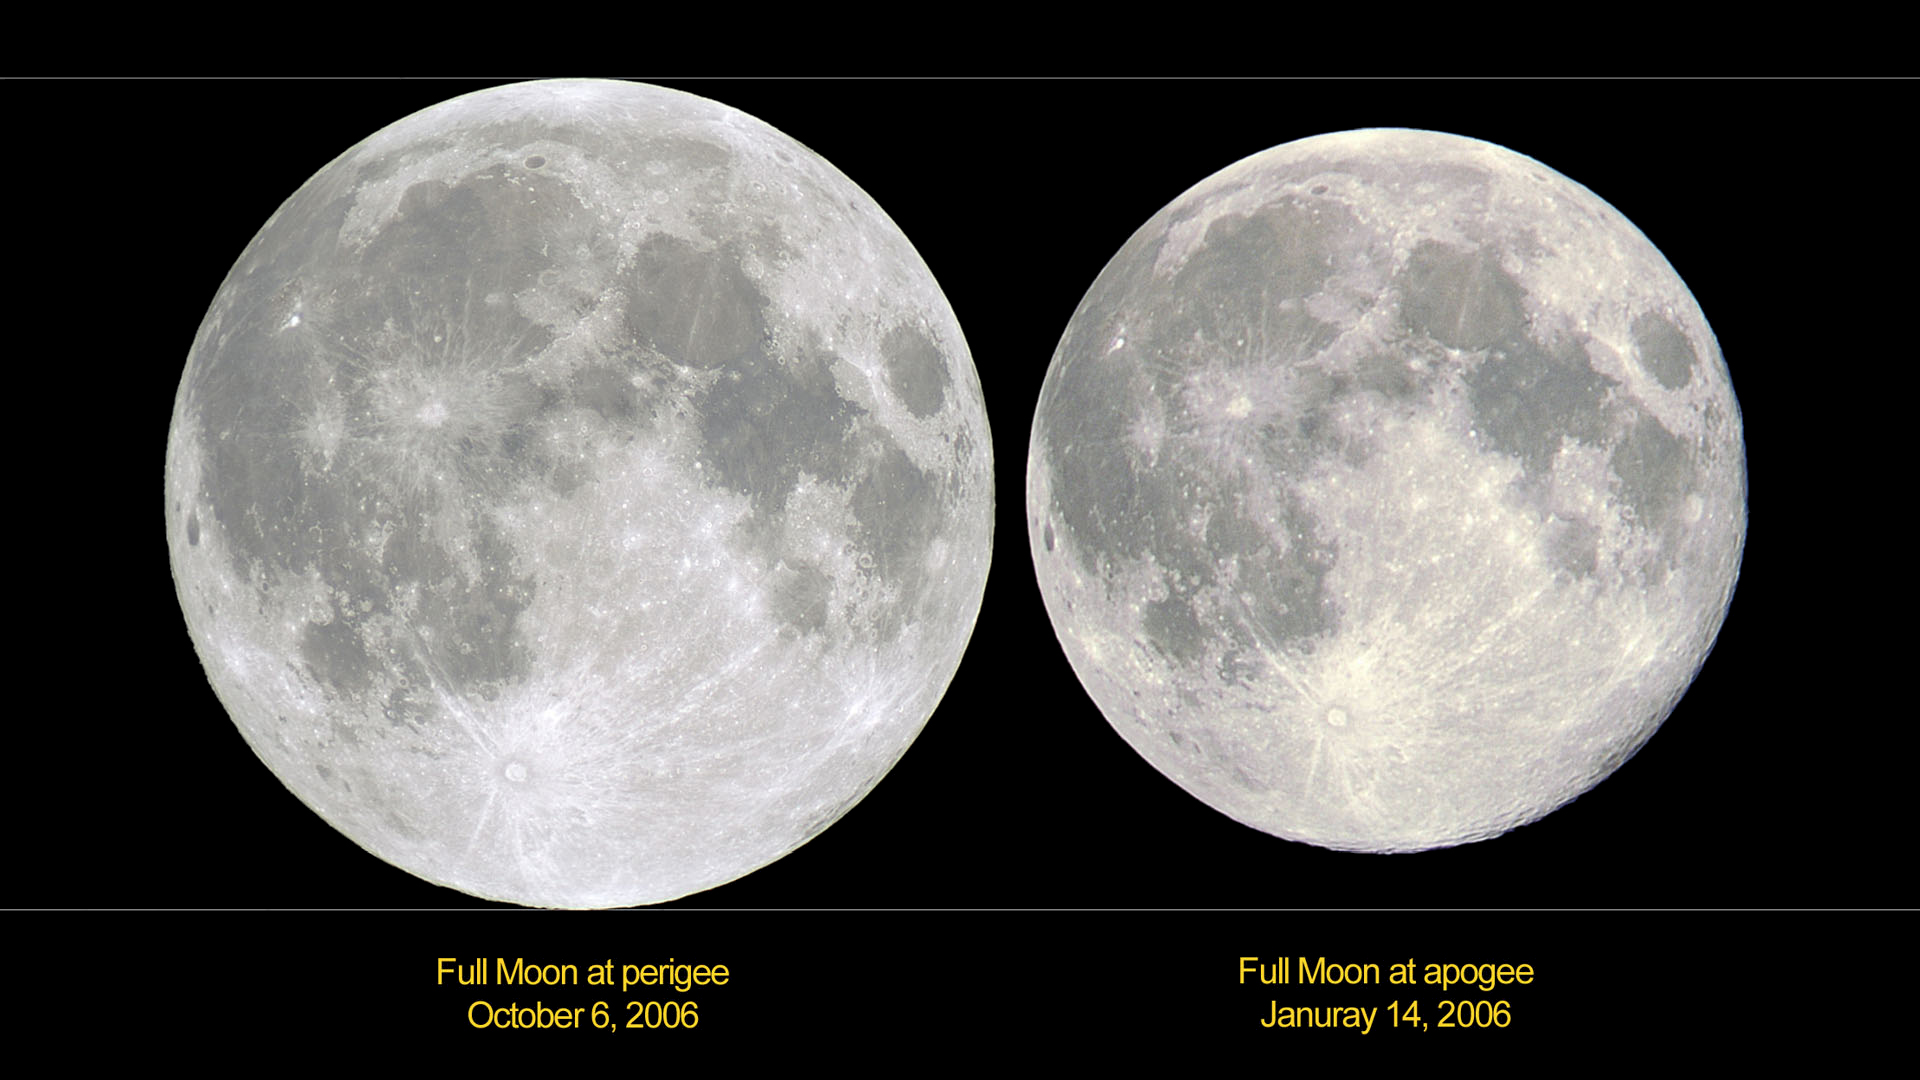 Full Moon comparison